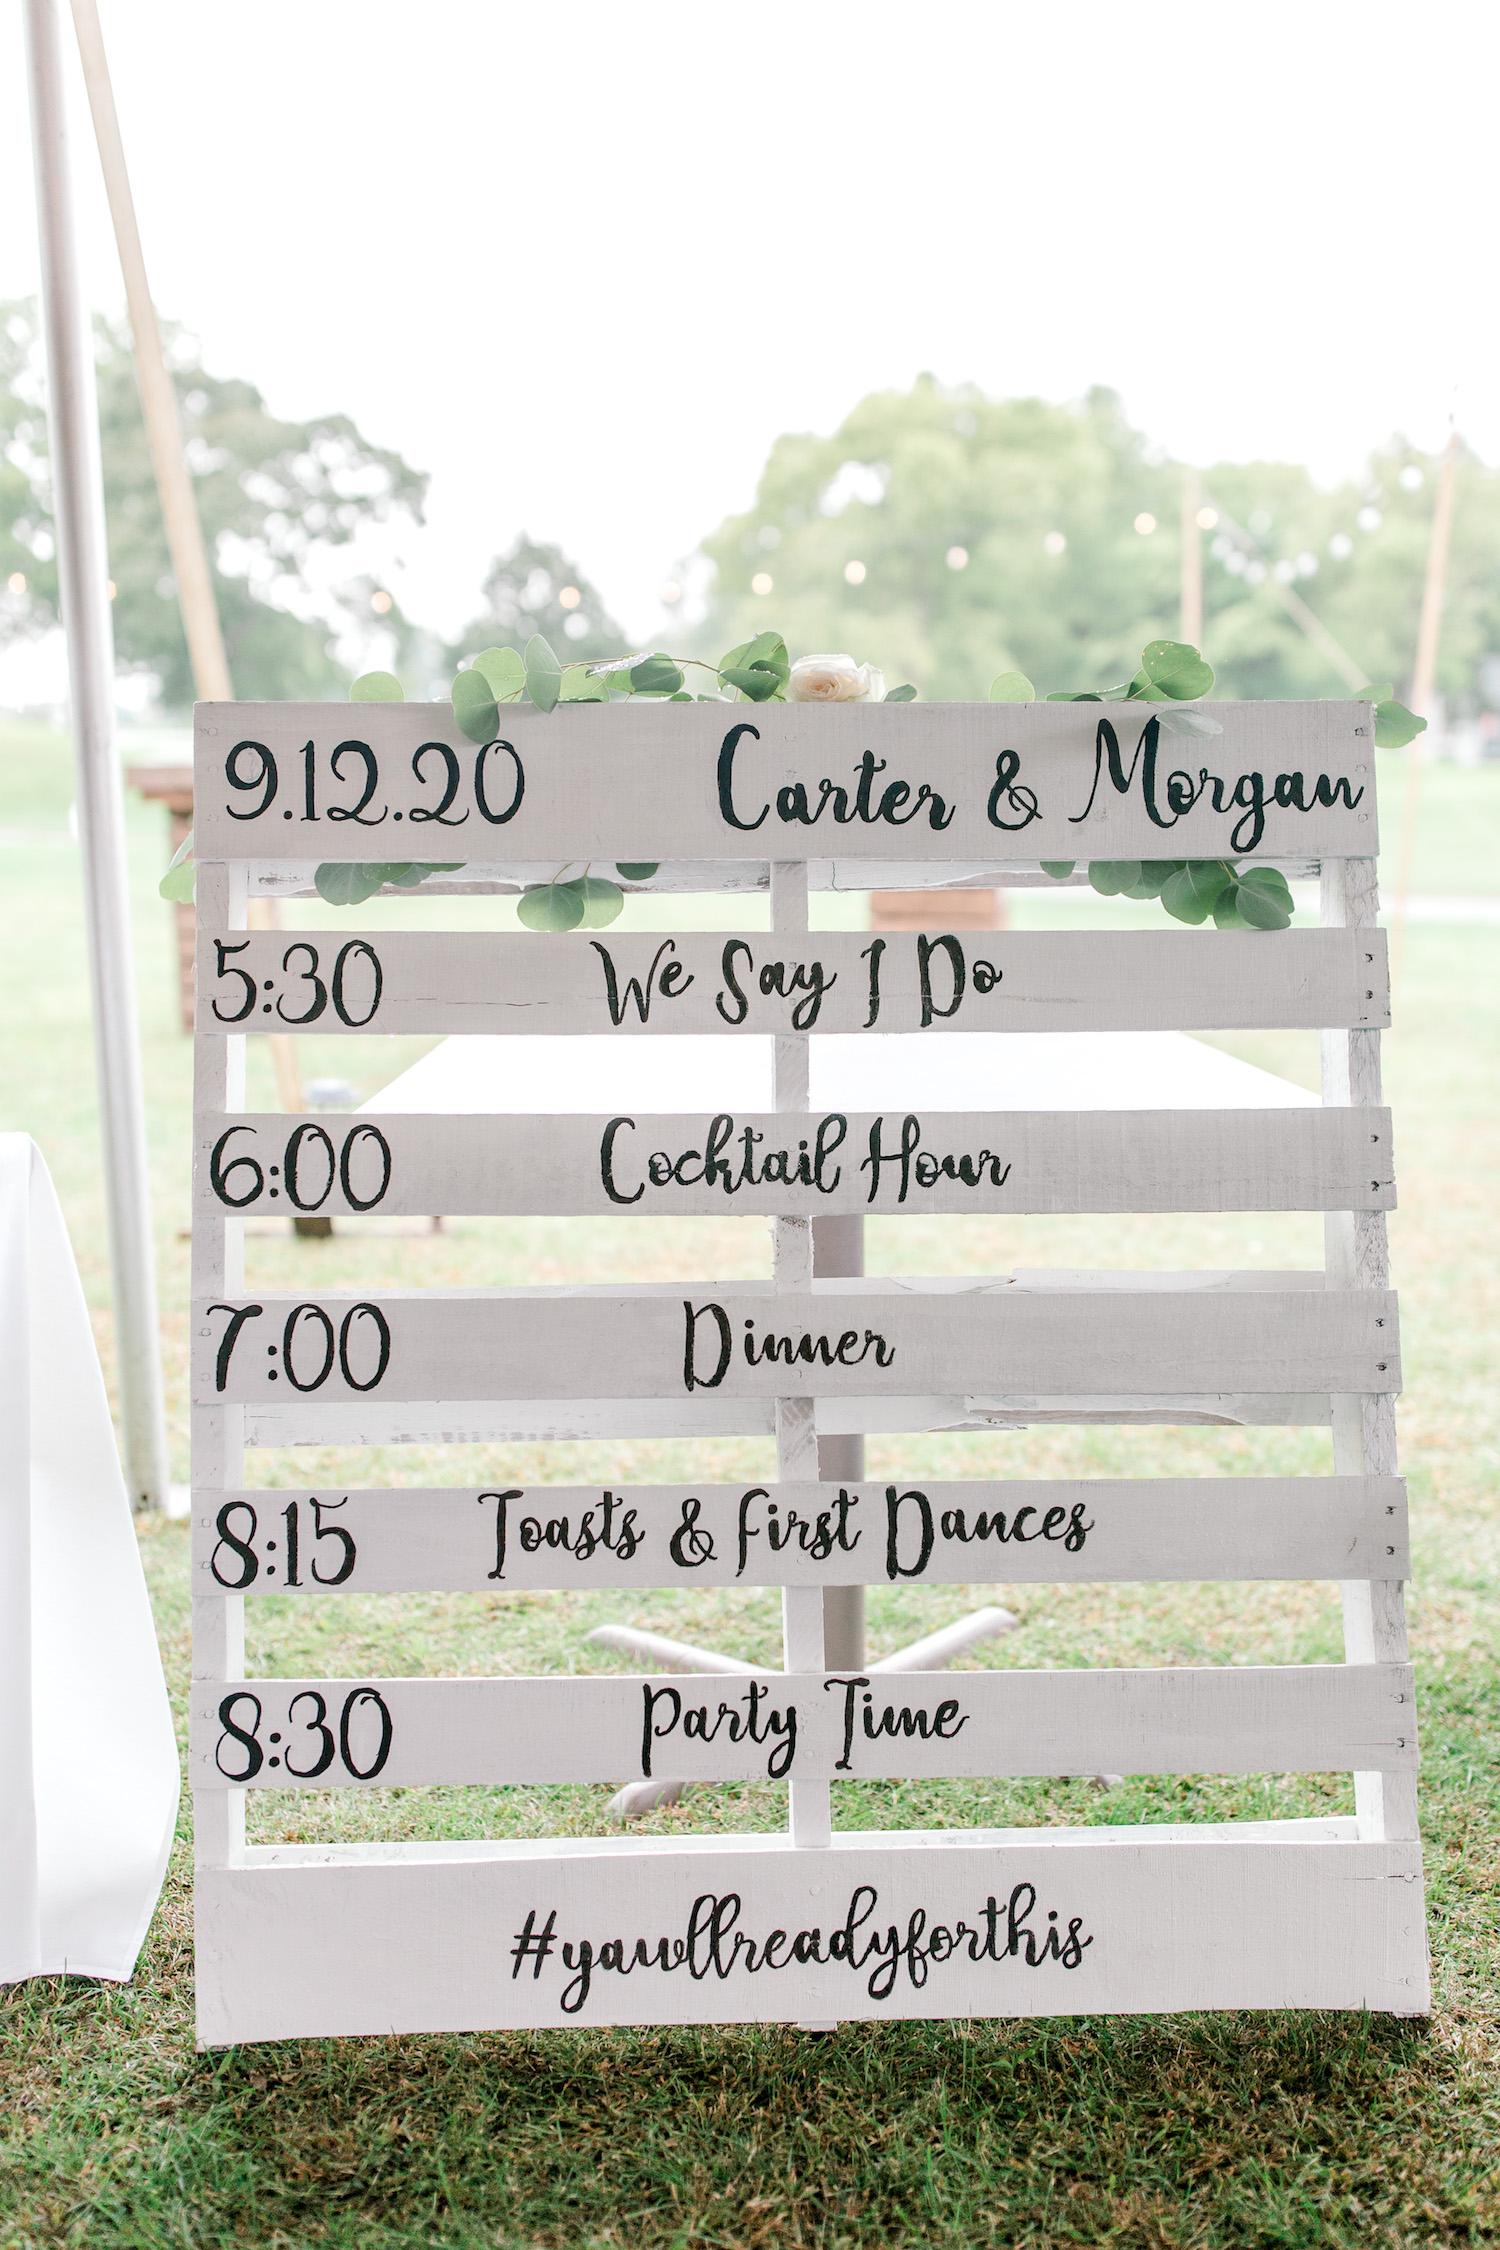 Wallinwood Springs Golf Course wedding timeline on pallet